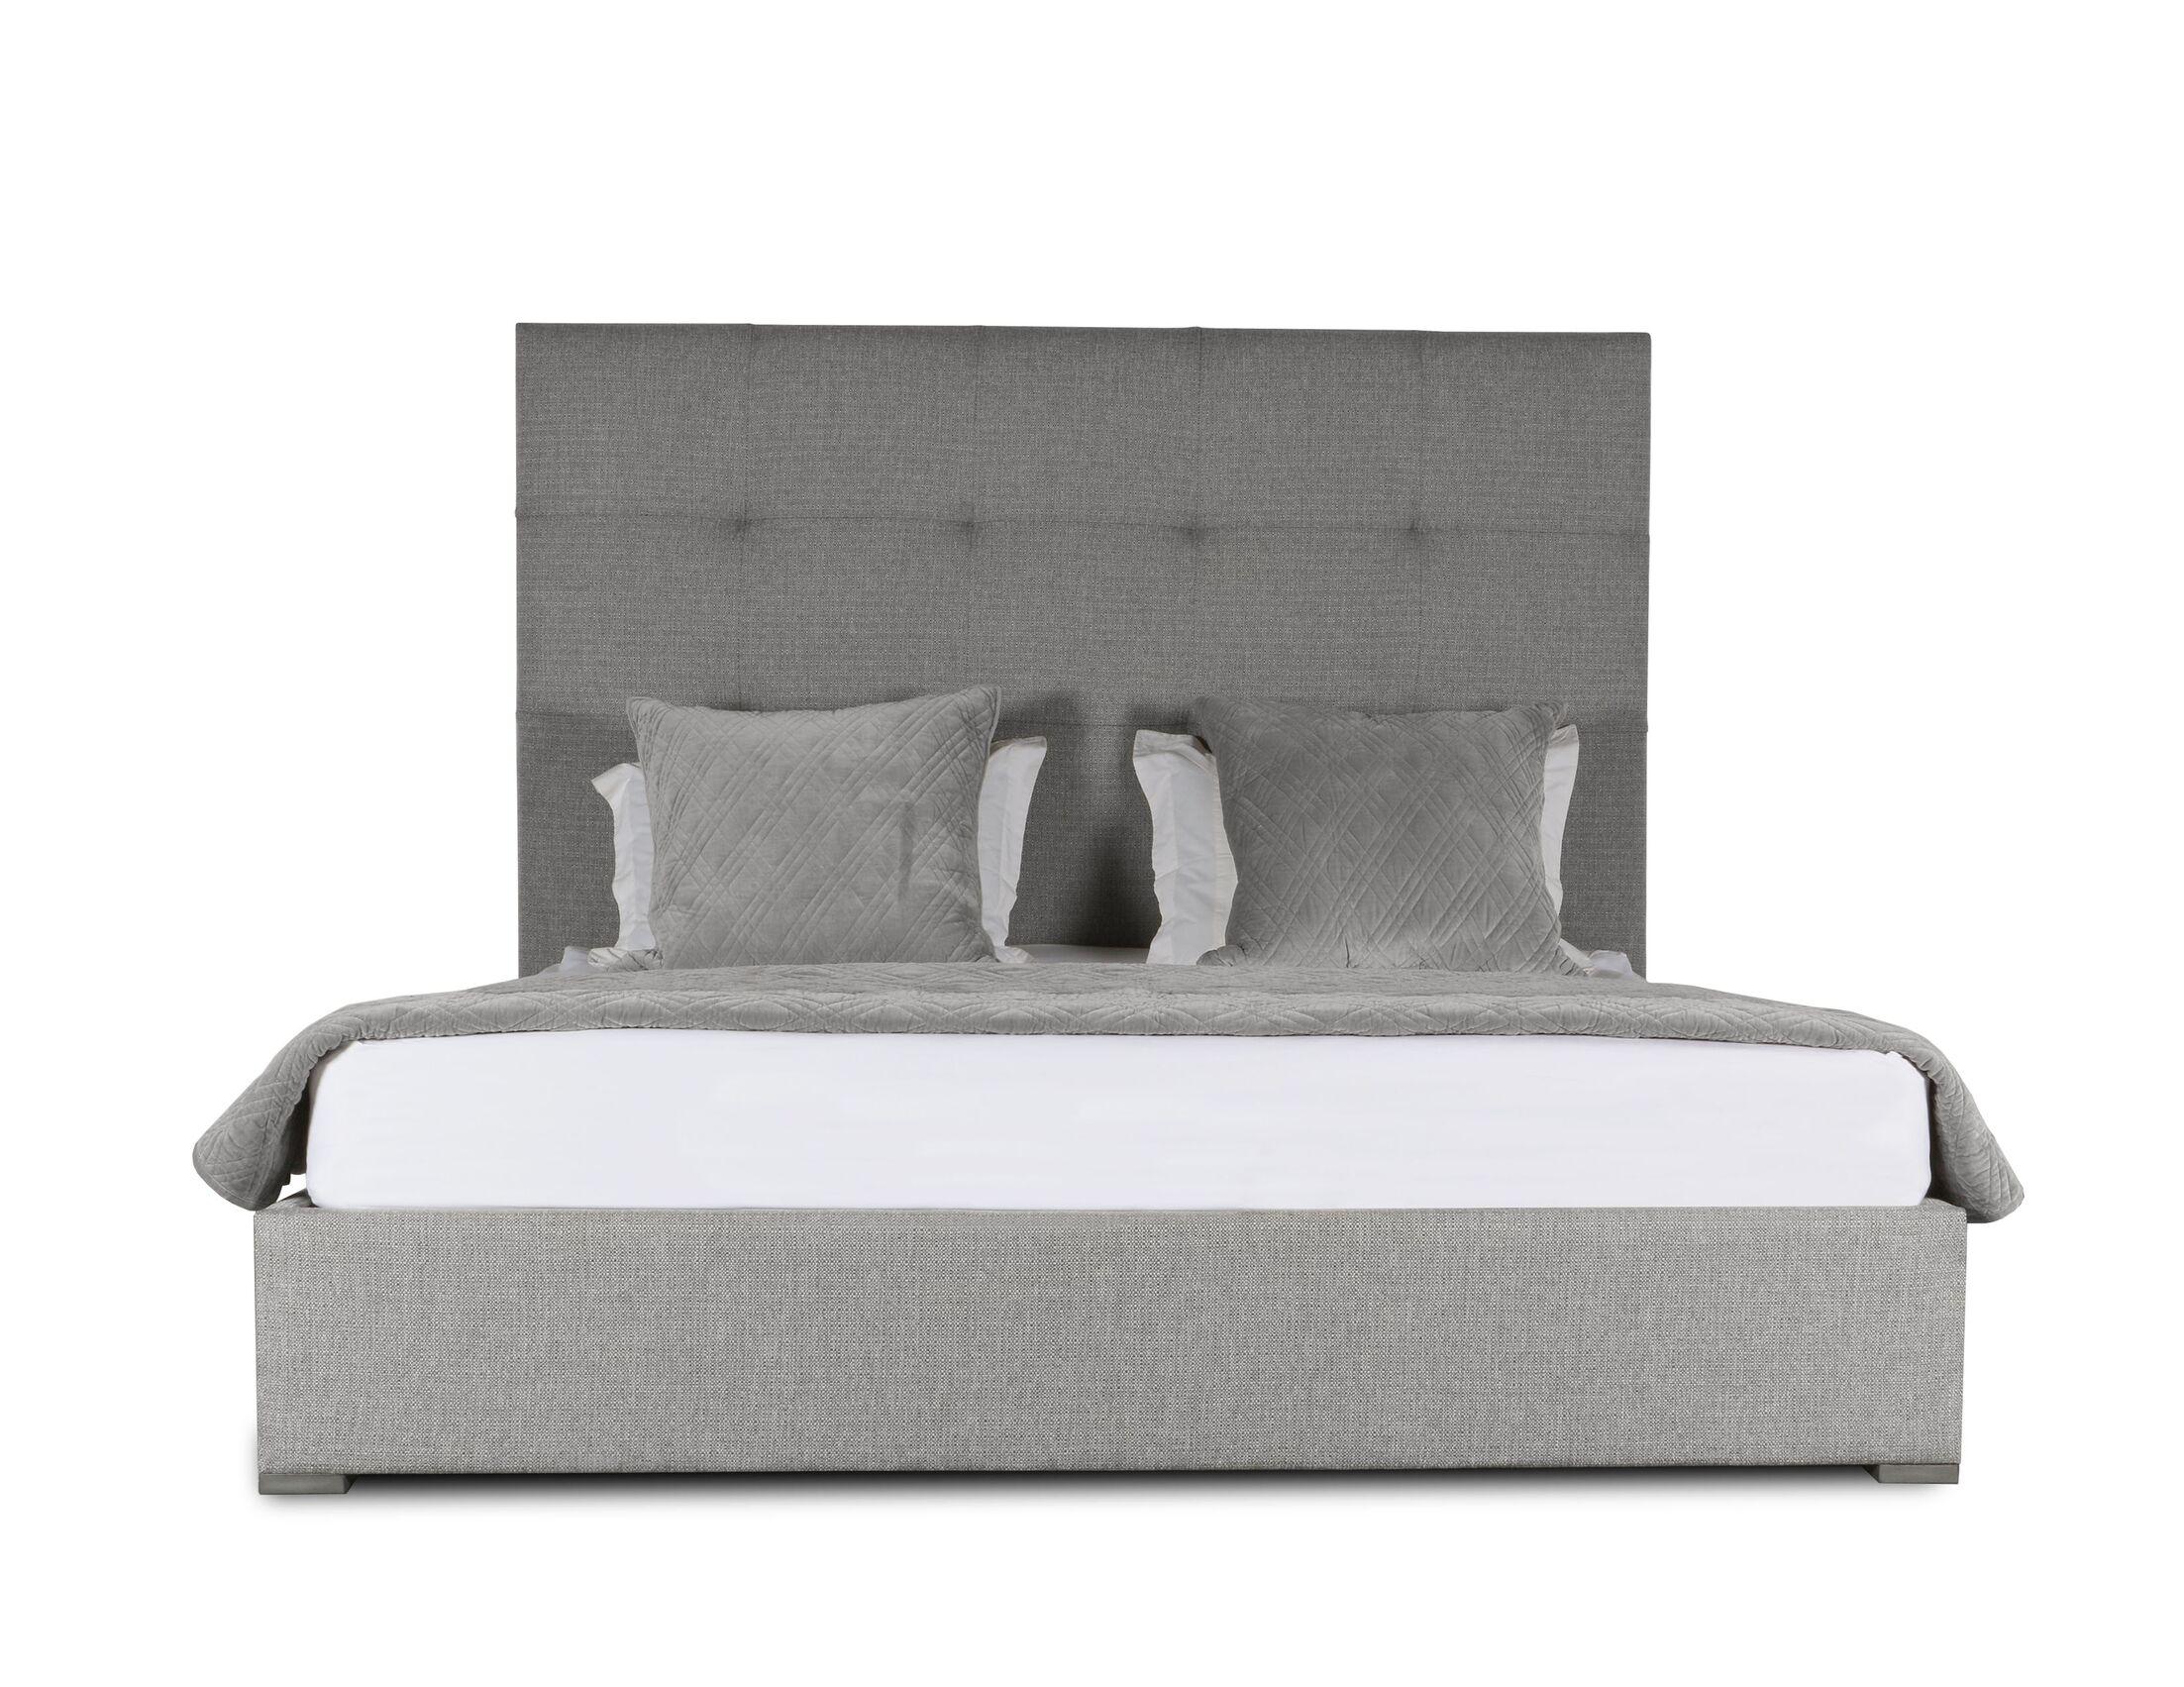 Handley Upholstered Platform Bed Color: Gray, Size: High Height King